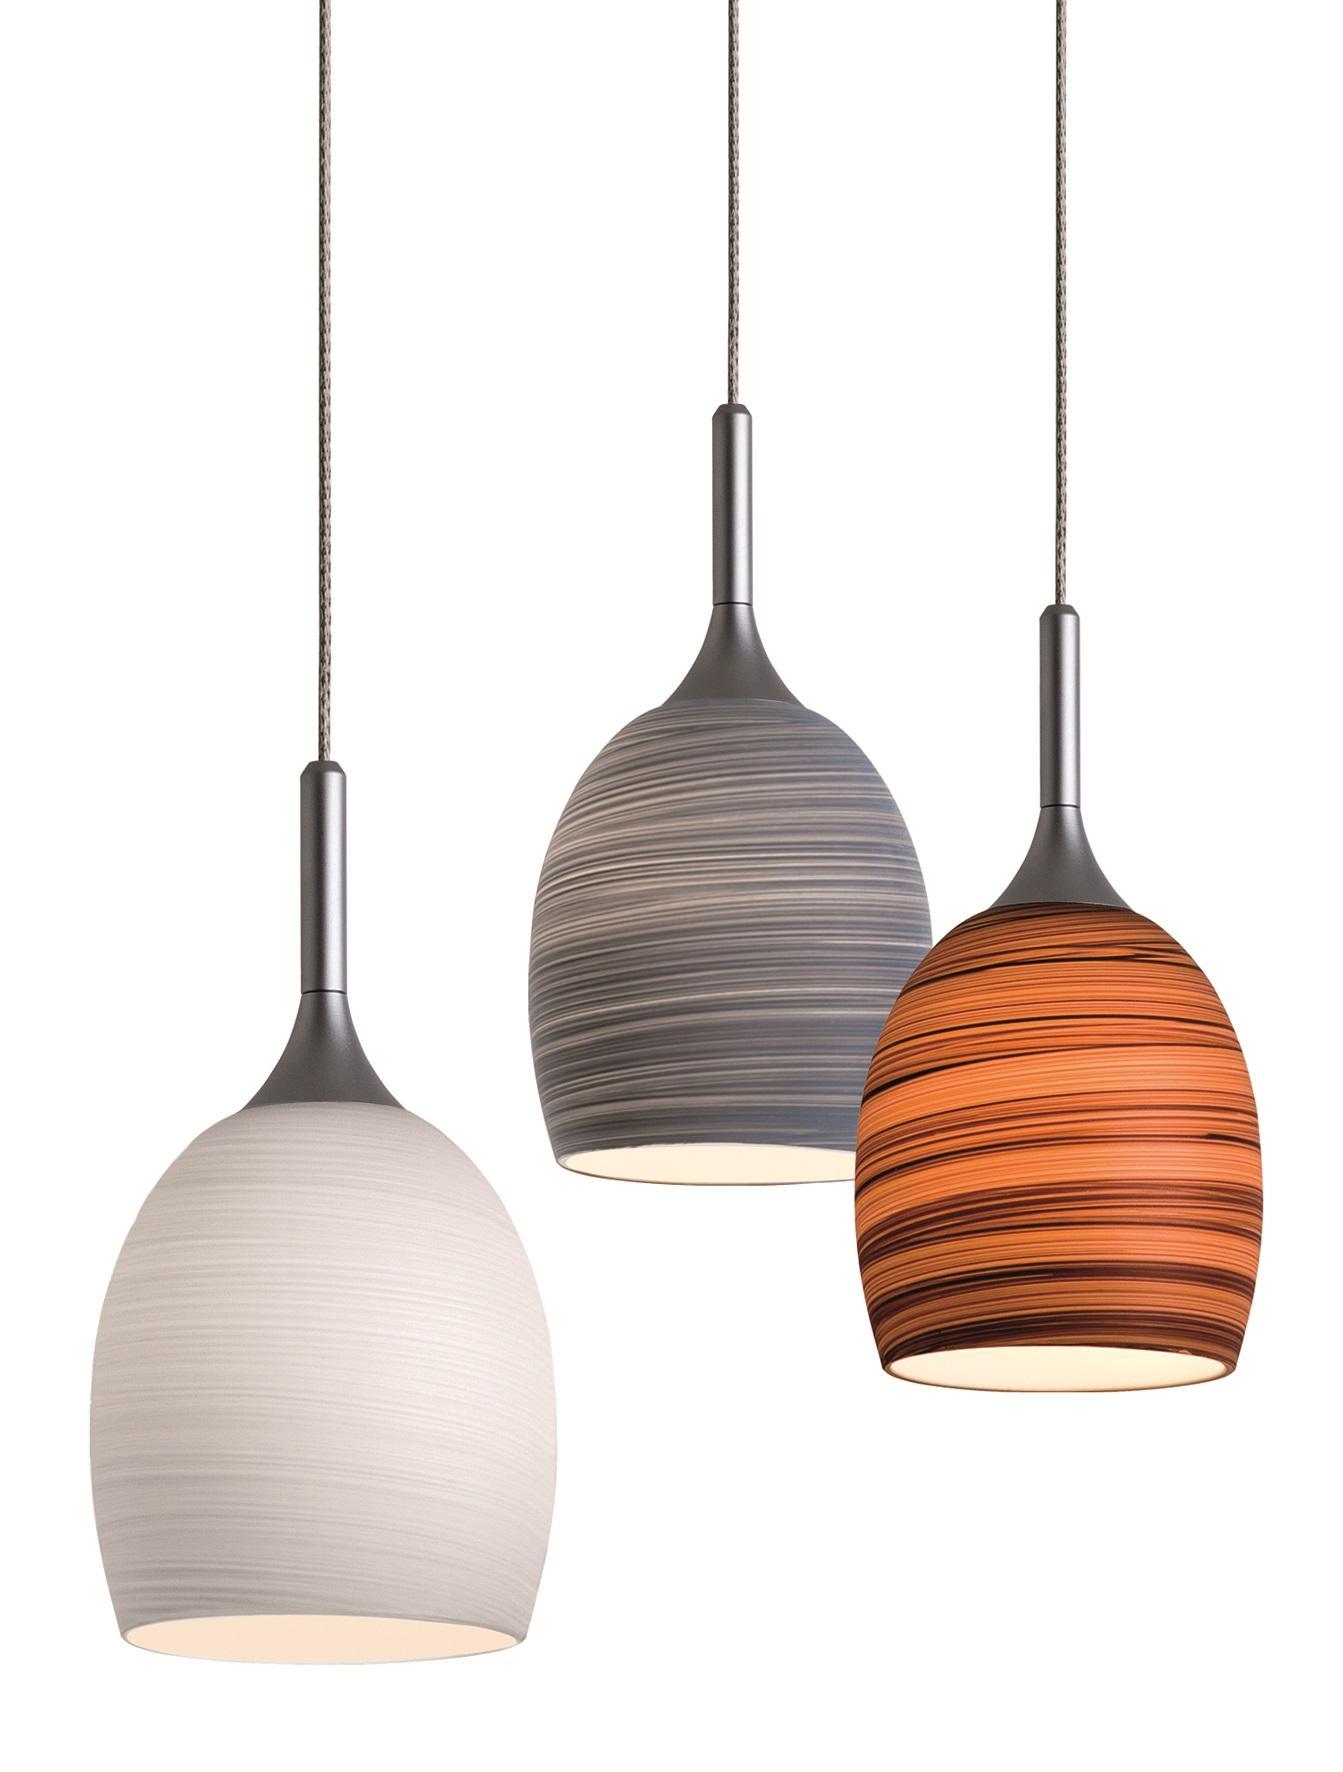 b2c light leuchten g nstig kaufen. Black Bedroom Furniture Sets. Home Design Ideas